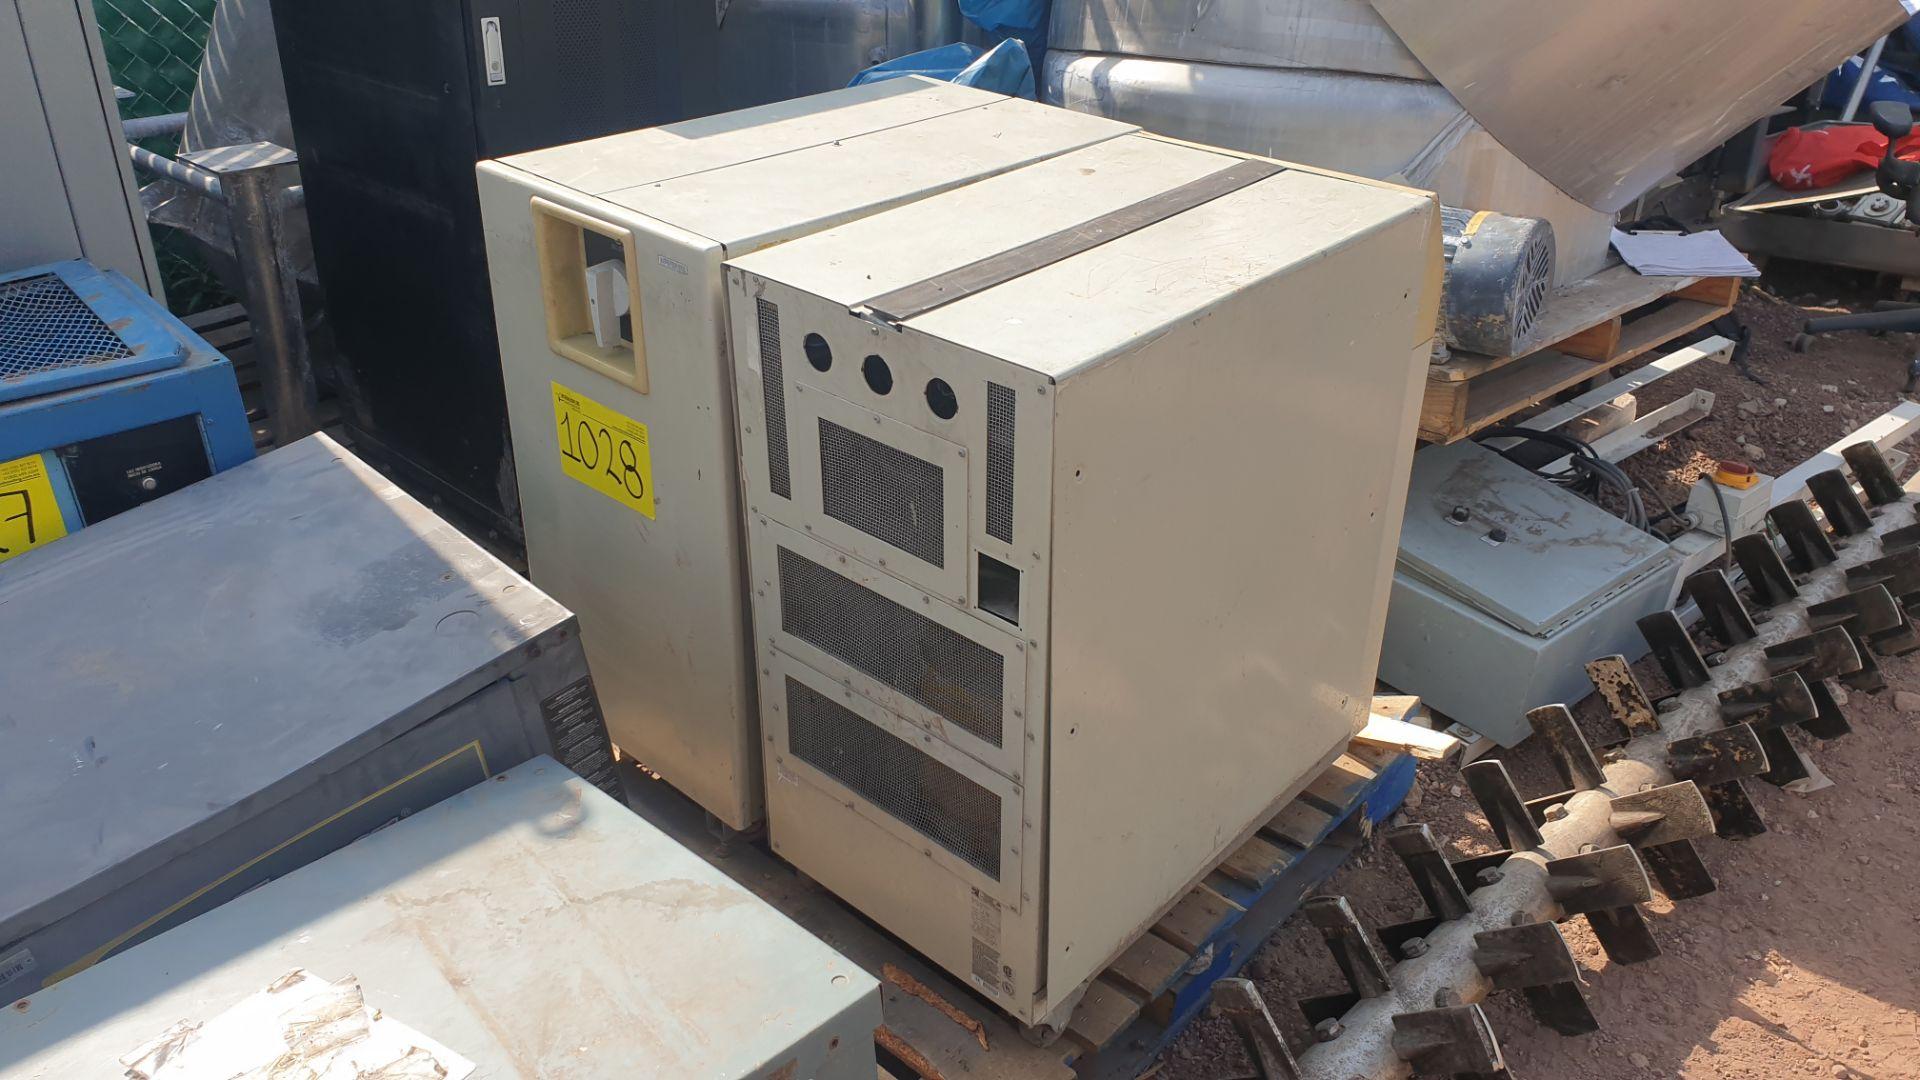 1 Ferrups Power bank system model FD10KVA 208-240V includes Lortec UPS of 3KVA - Image 8 of 11